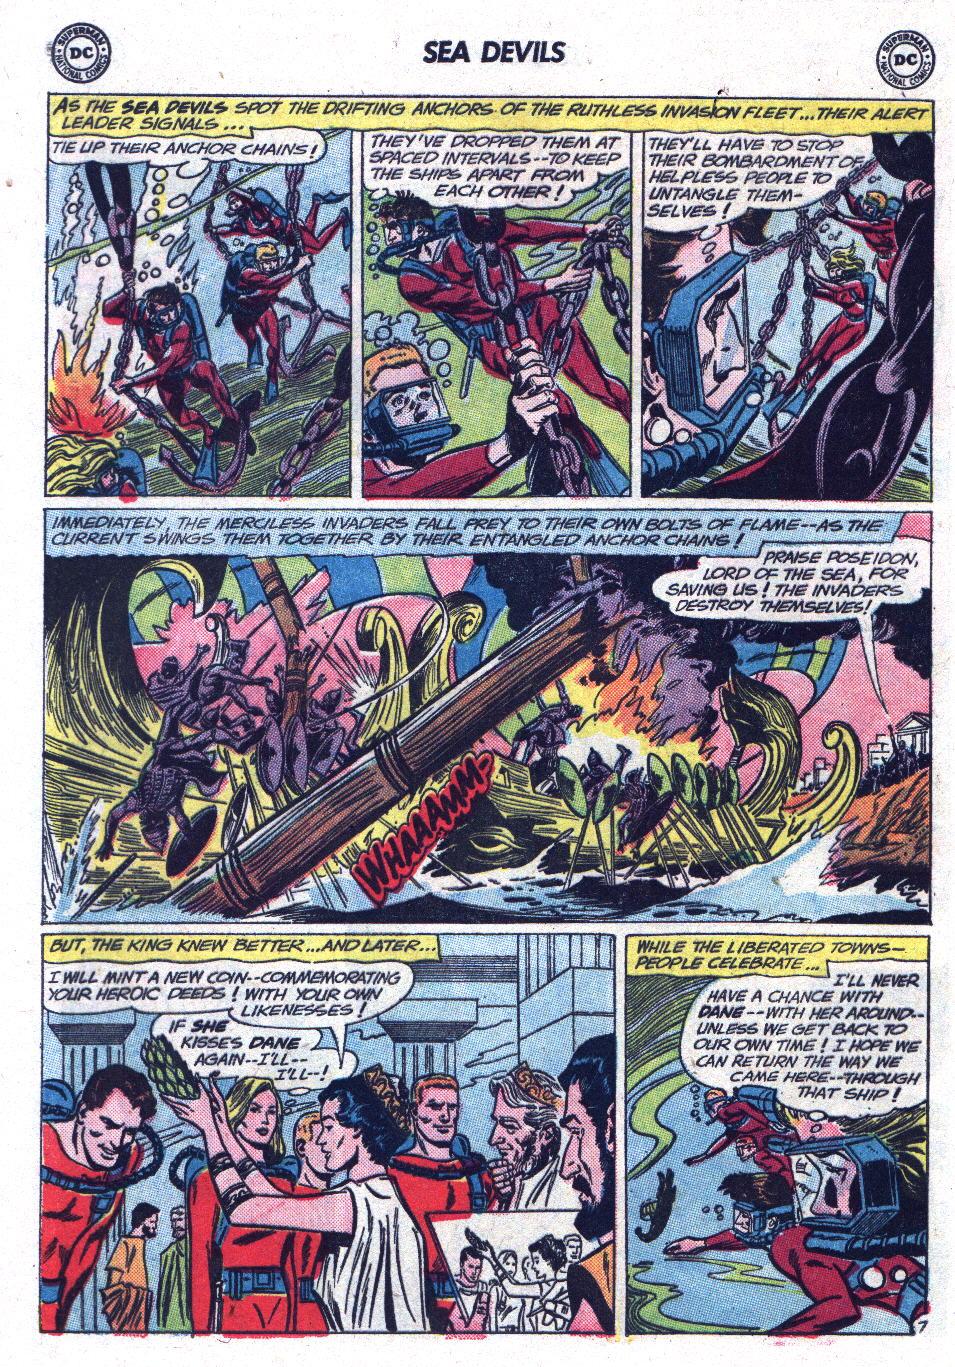 Read online Sea Devils comic -  Issue #13 - 20